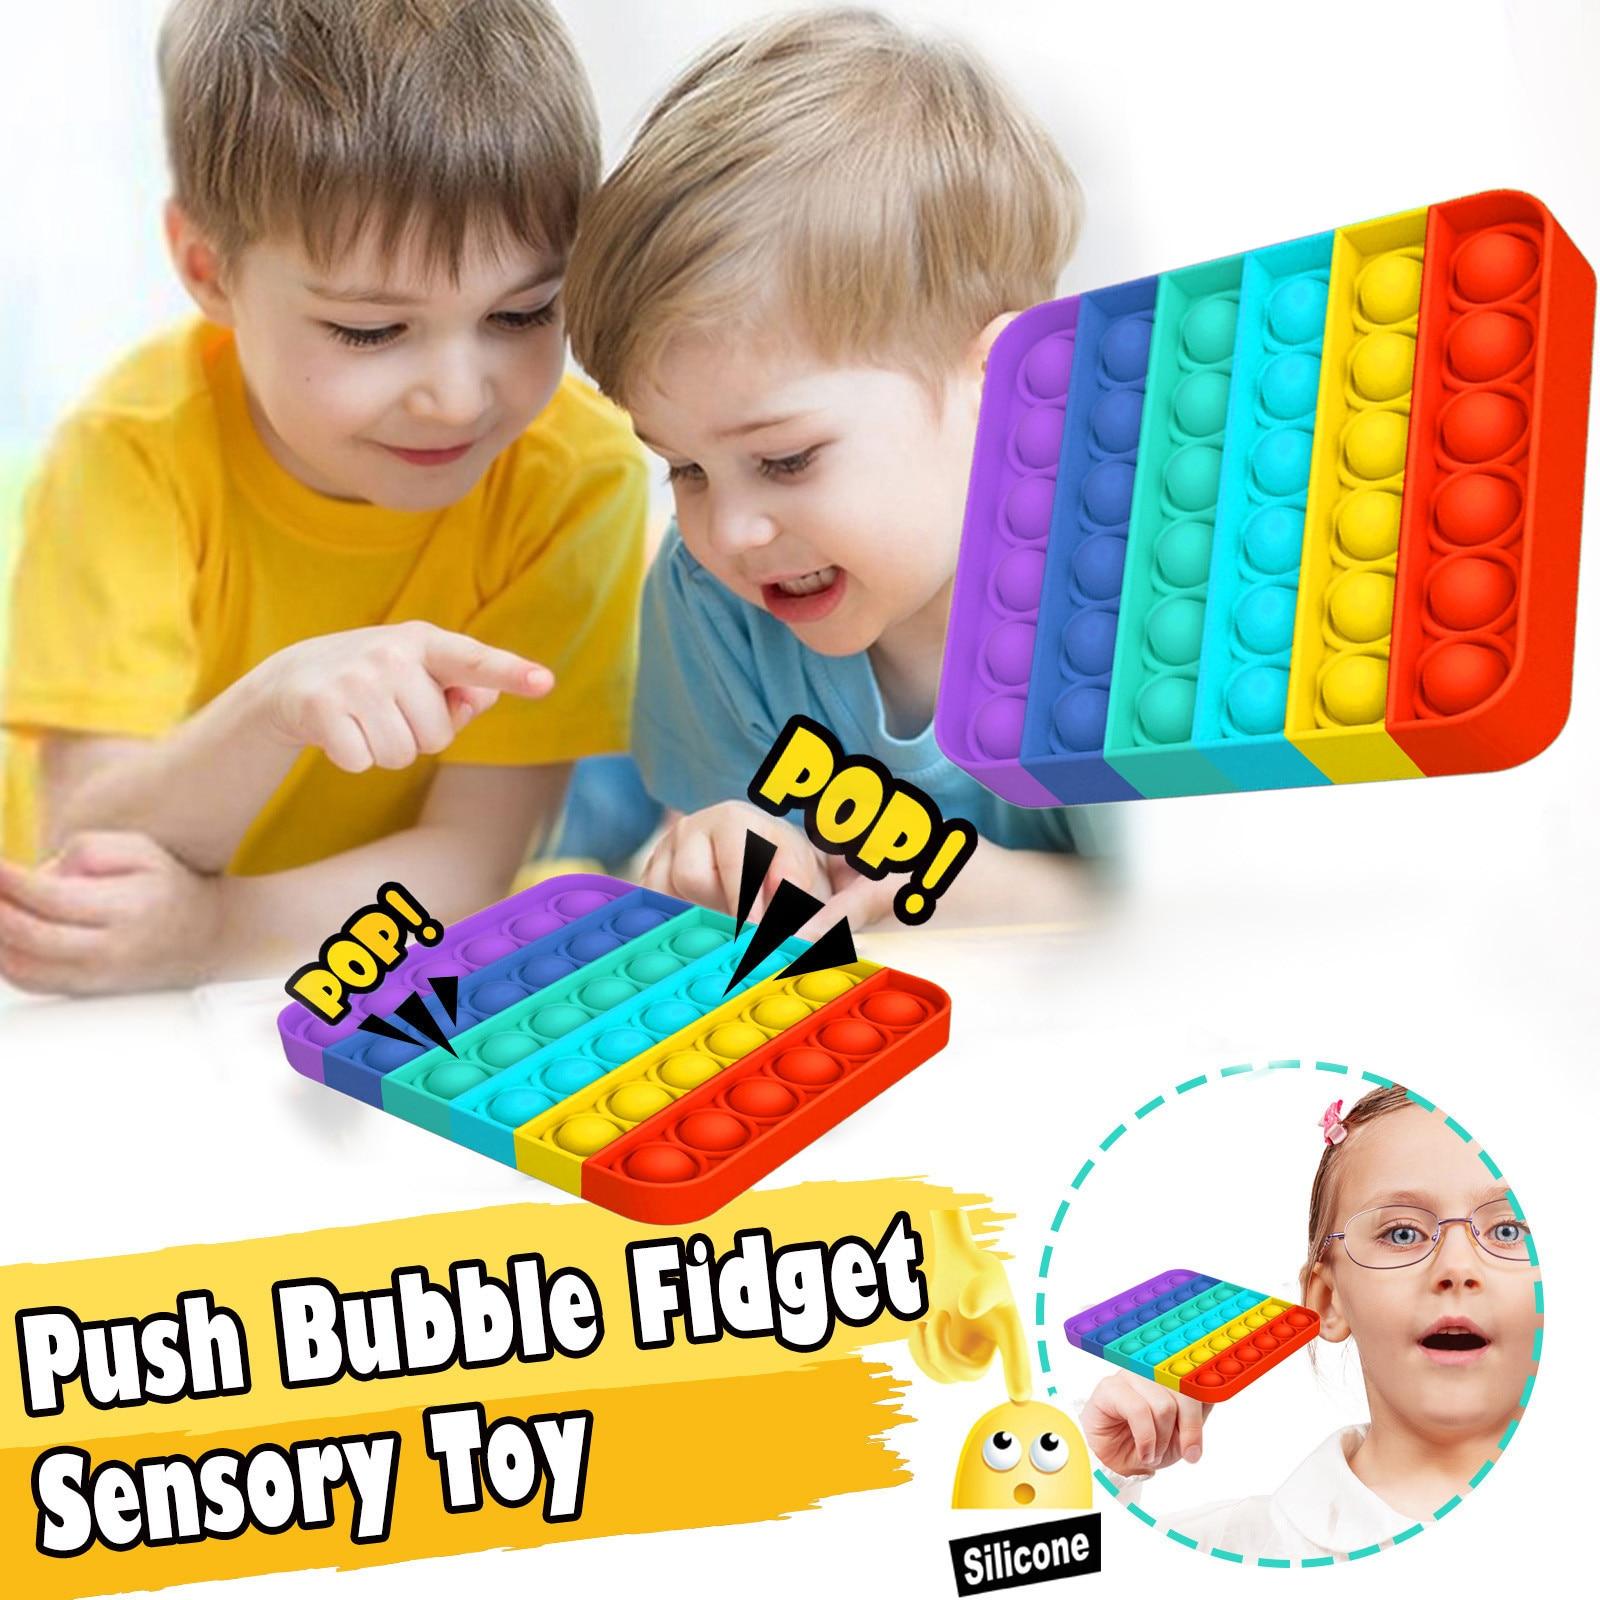 Push Pop Bubble Sensory Toy